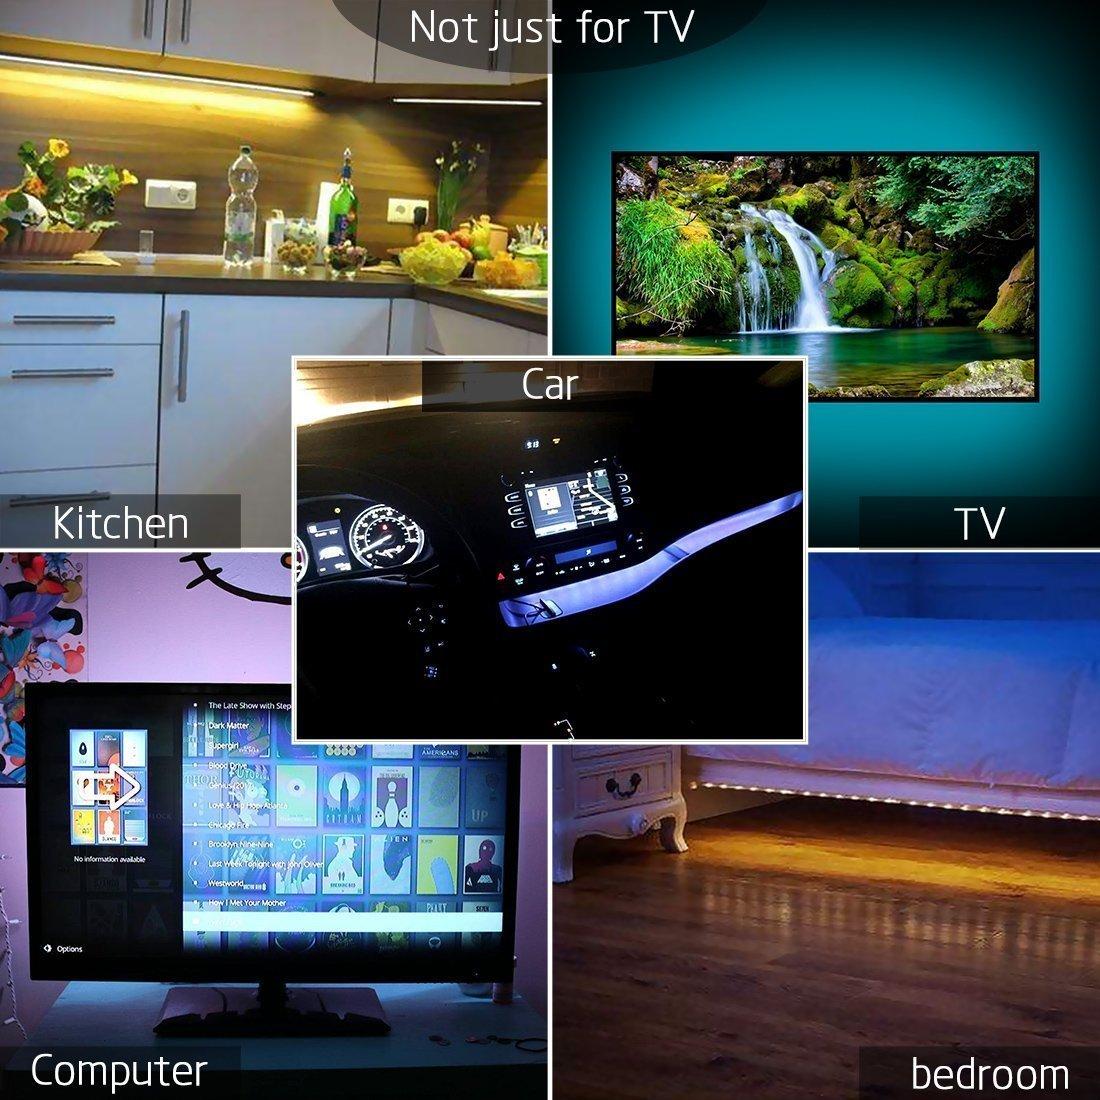 3.28Ft USB LED Strip Light,SMY LED TV Backlight,RGB Multi-Colour LED Light Strip Kit Waterproof IP65,30LED with Wireless Remote Controller for TV//PC//Laptop Bias Lighting